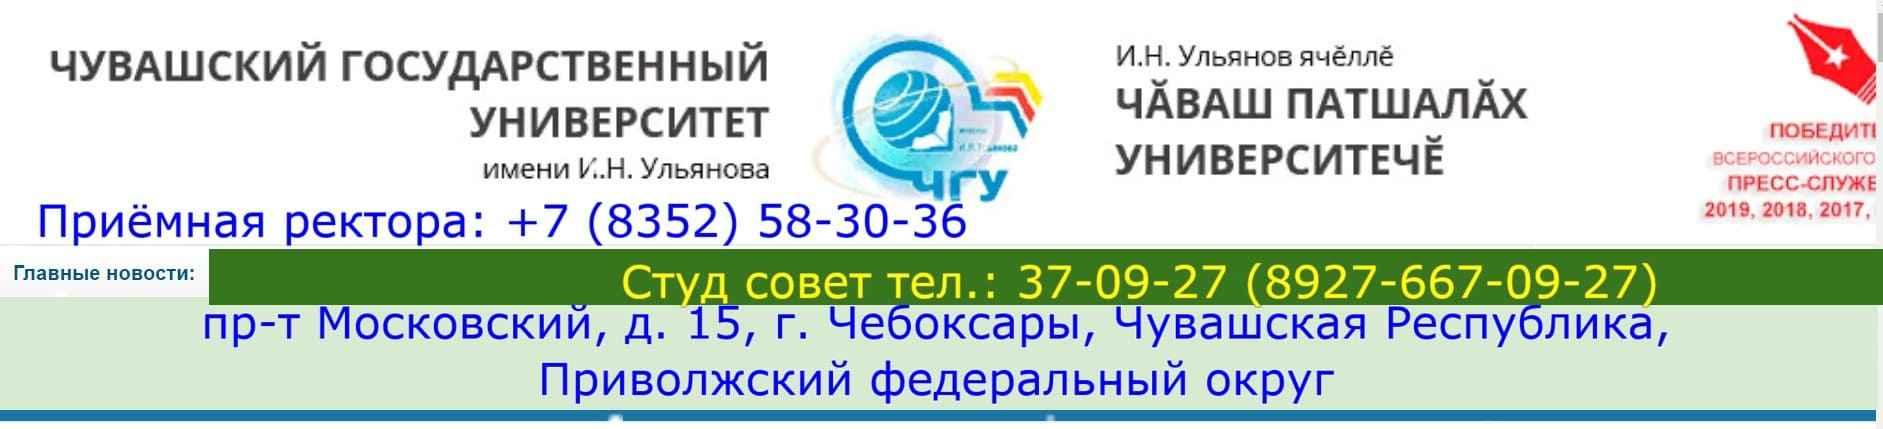 ЧГУ Ульянова сайт